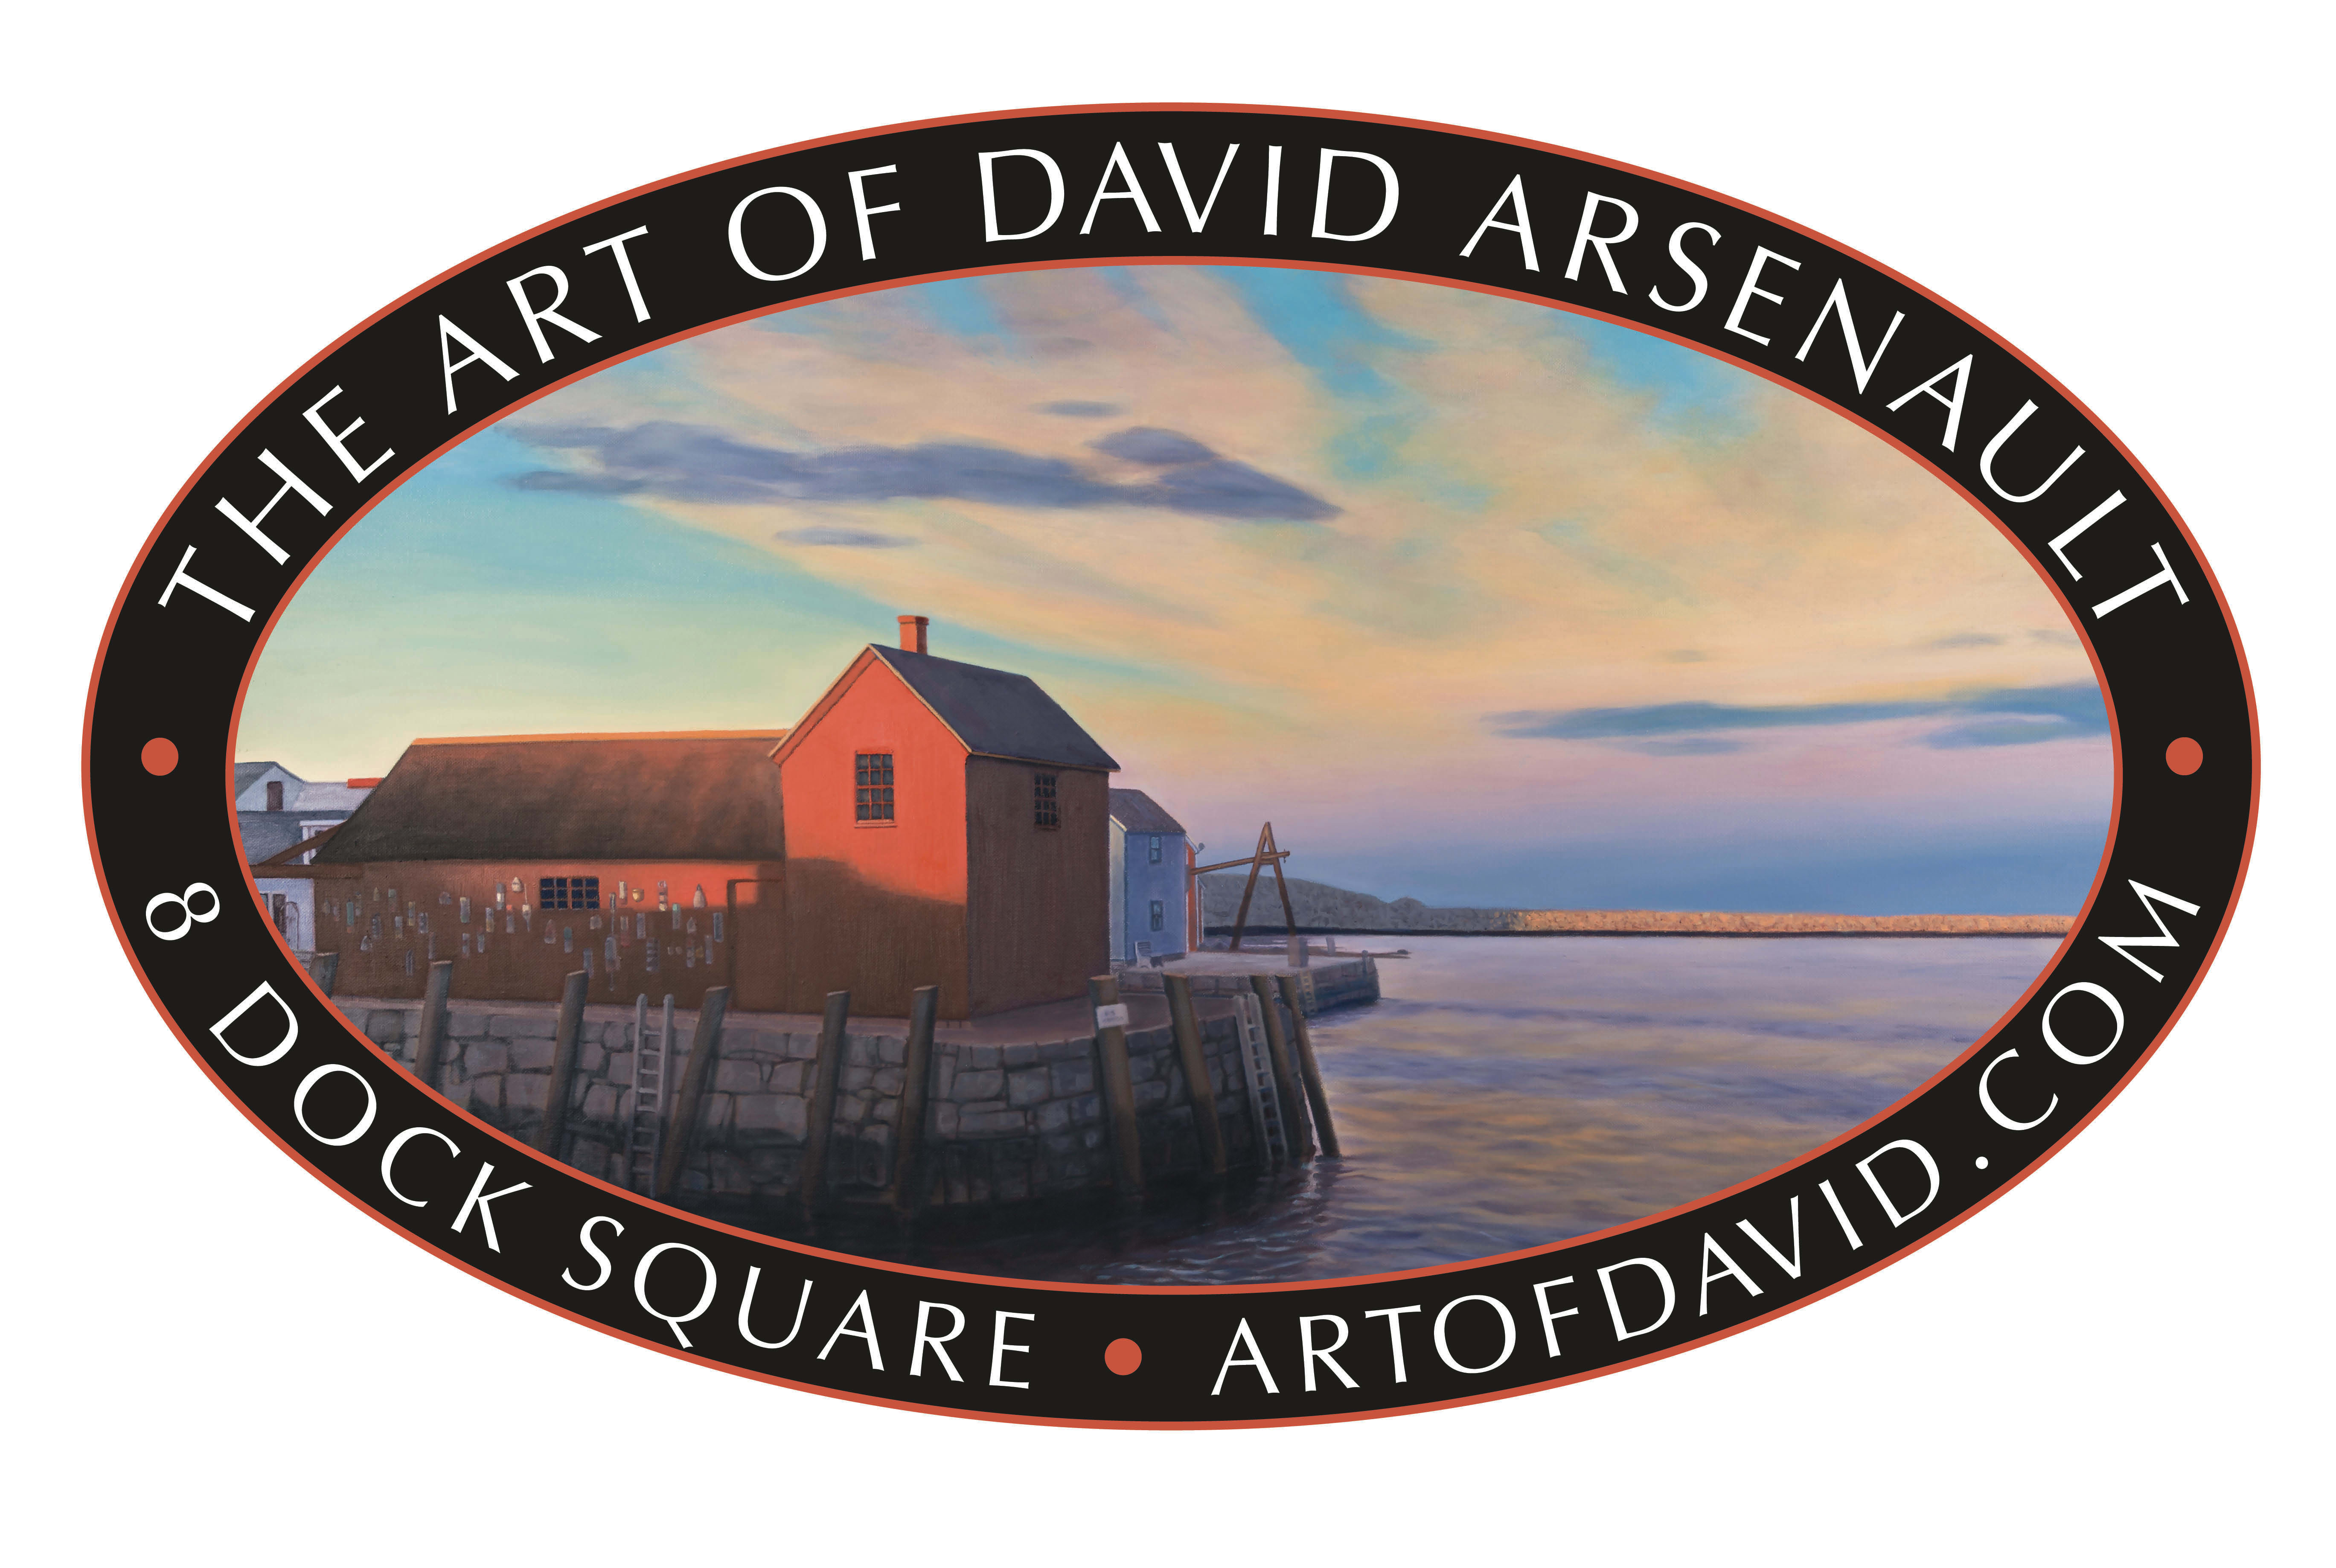 THE ART OF DAVID ARSENAULT